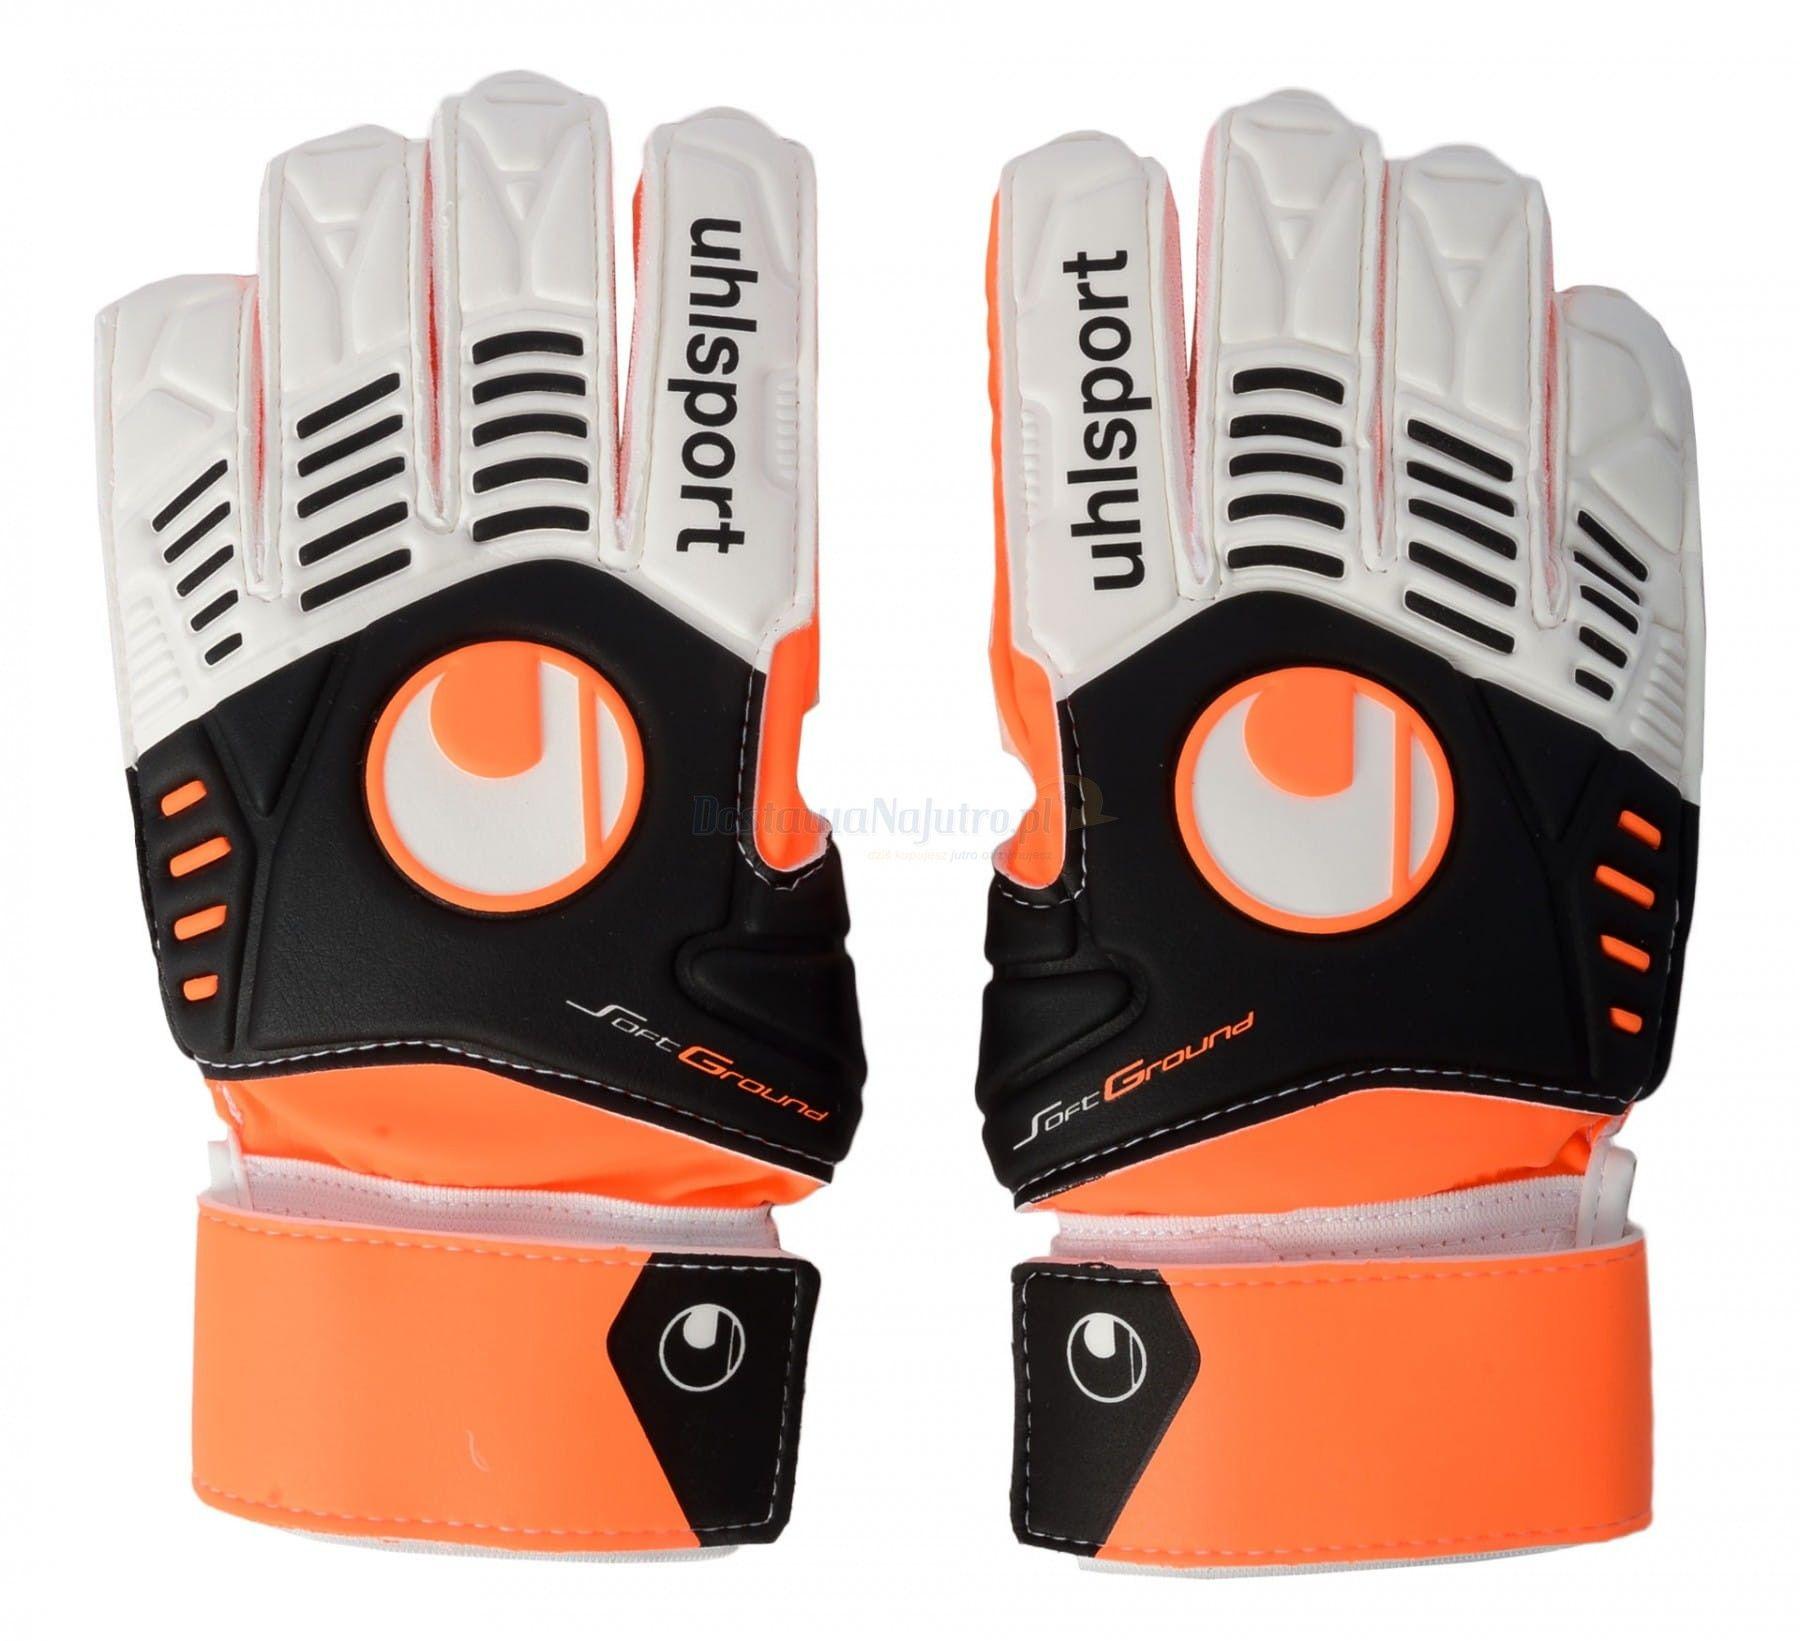 Rękawice bramkarskie Uhlsport Ergonomic Soft Training